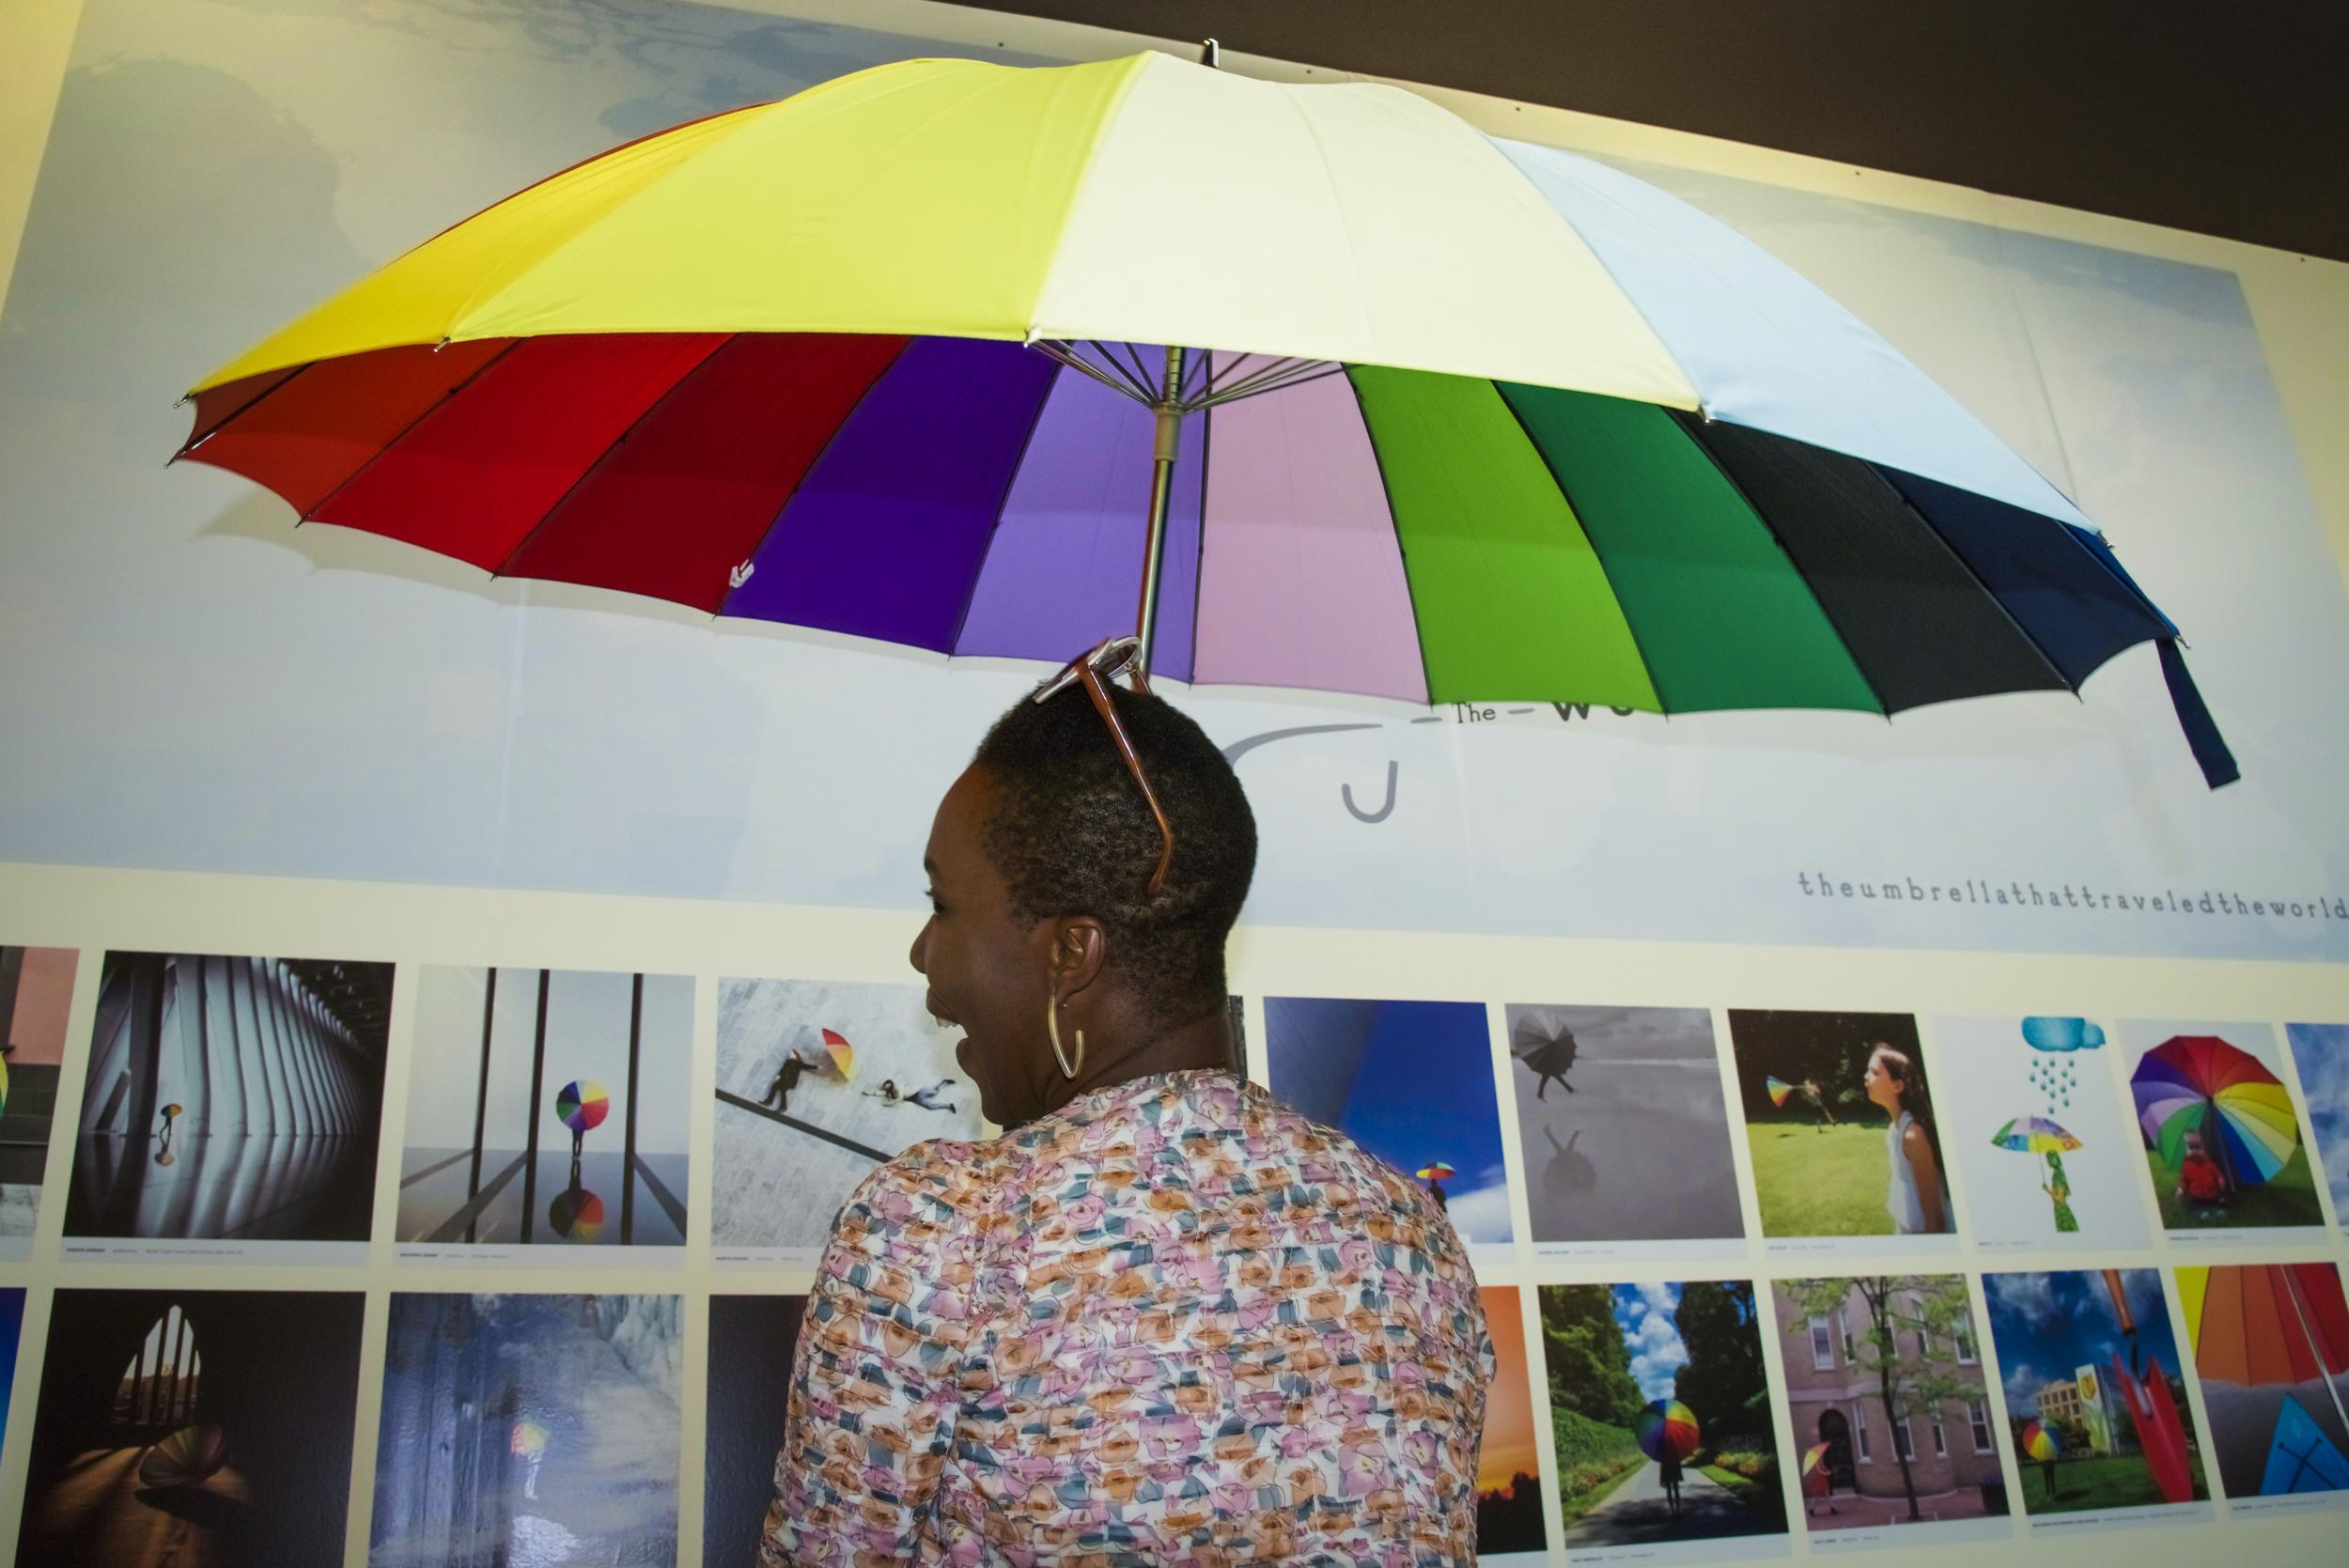 umbrella 16.jpg